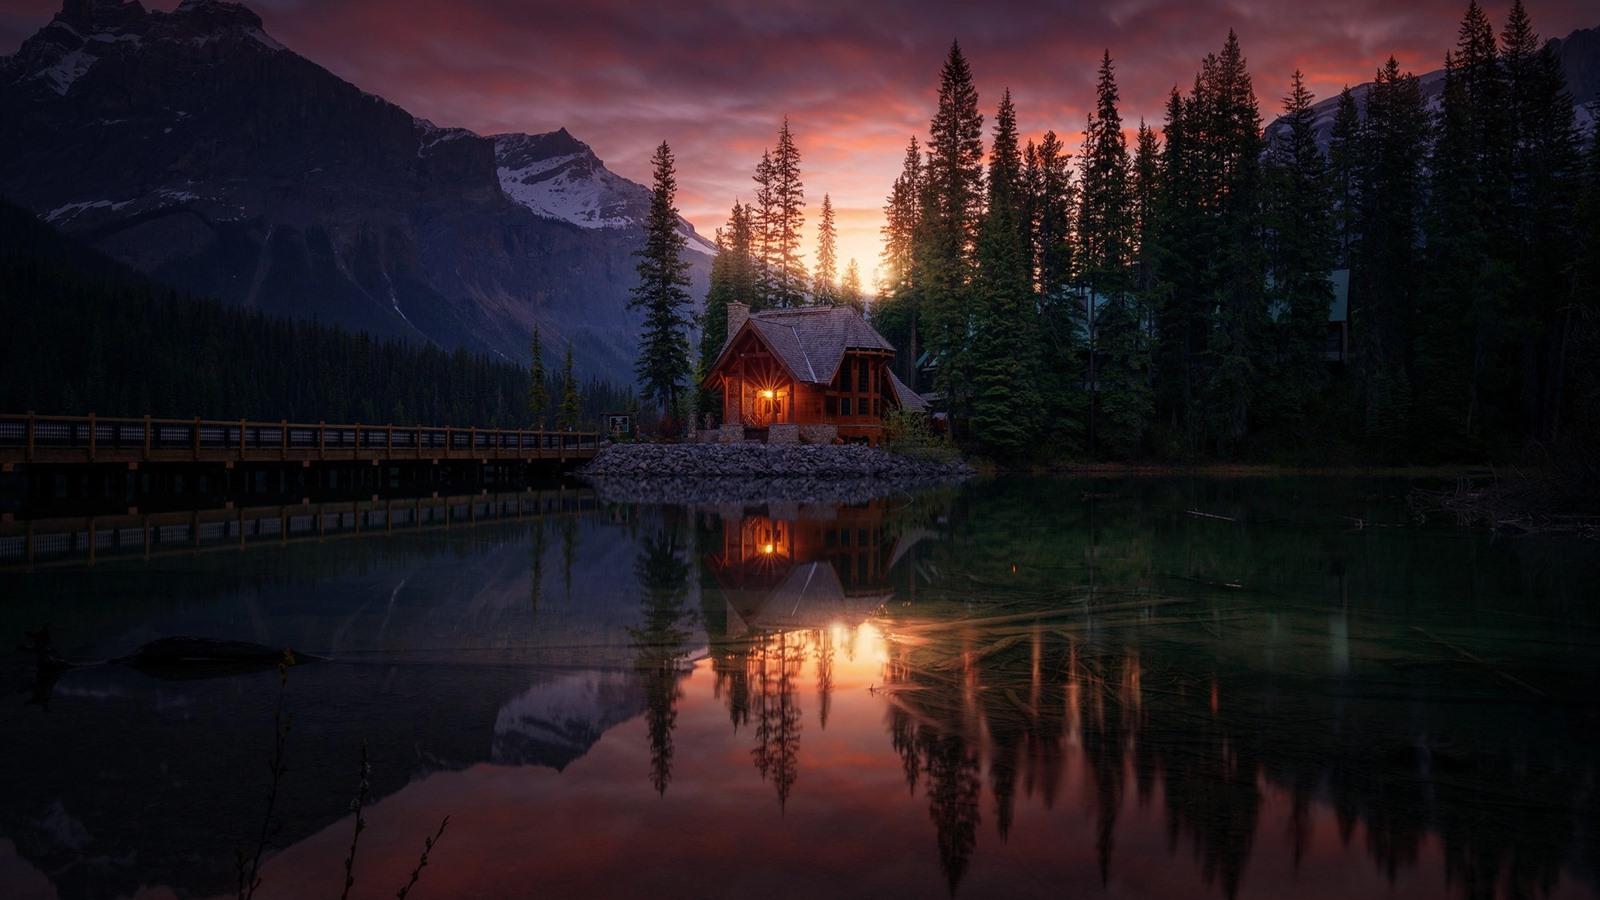 Forest Lake House Sunset Dusk 750x1334 Iphone 8 7 6 6s